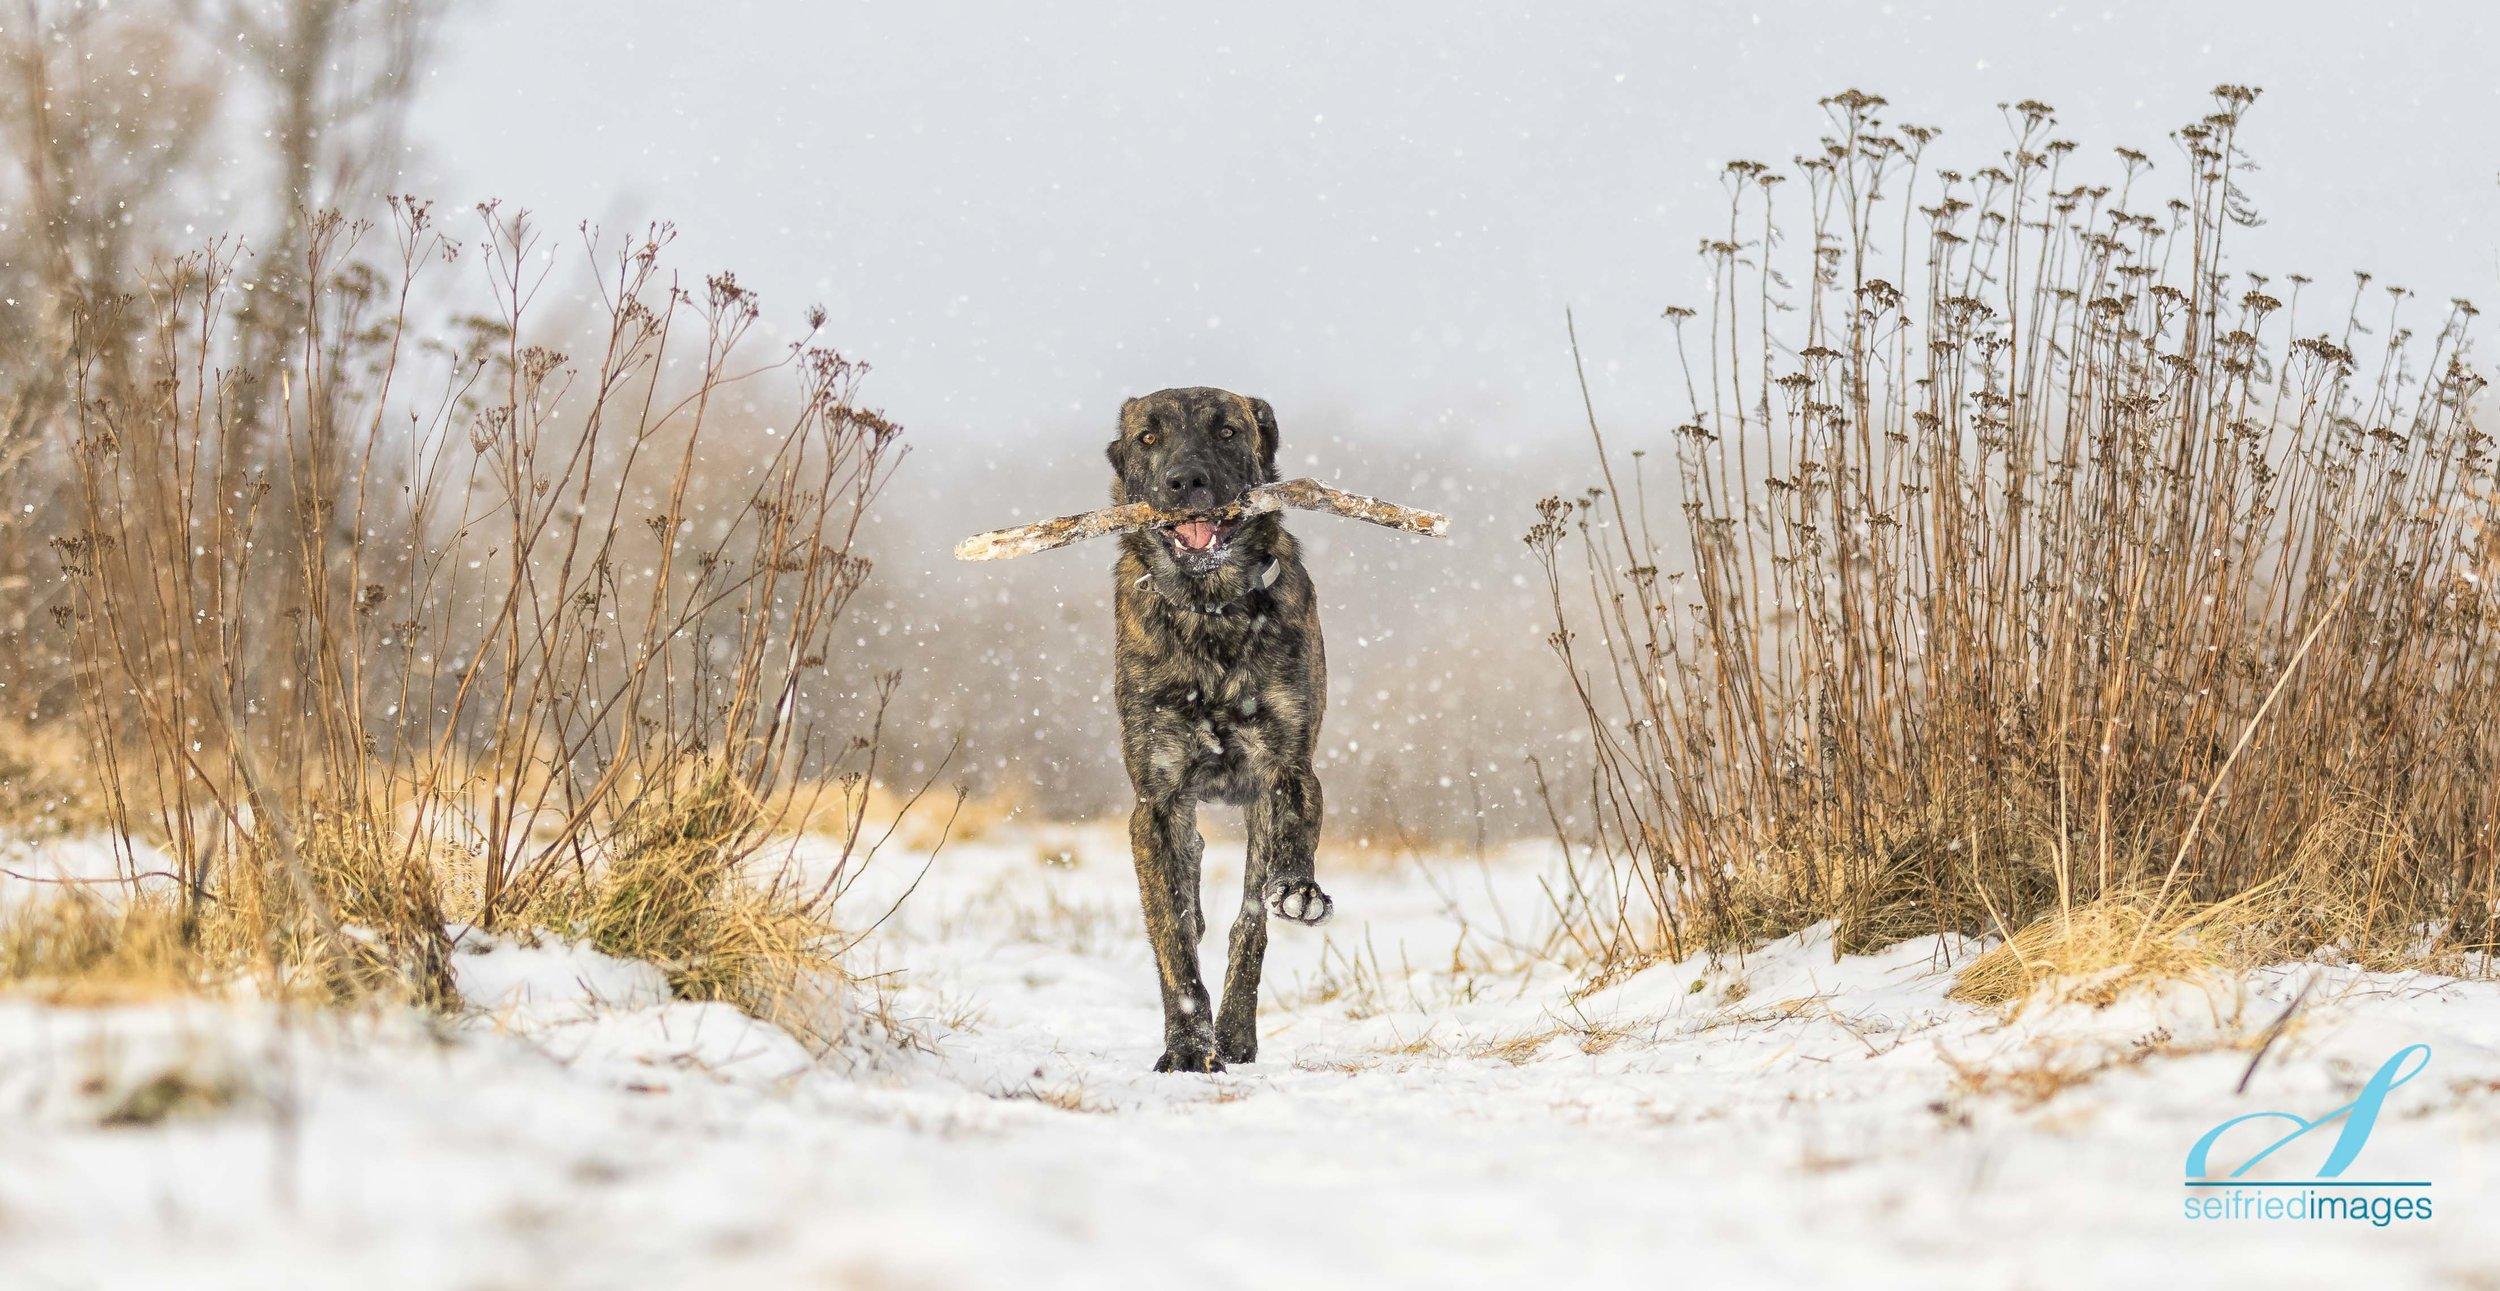 Snow and Stick